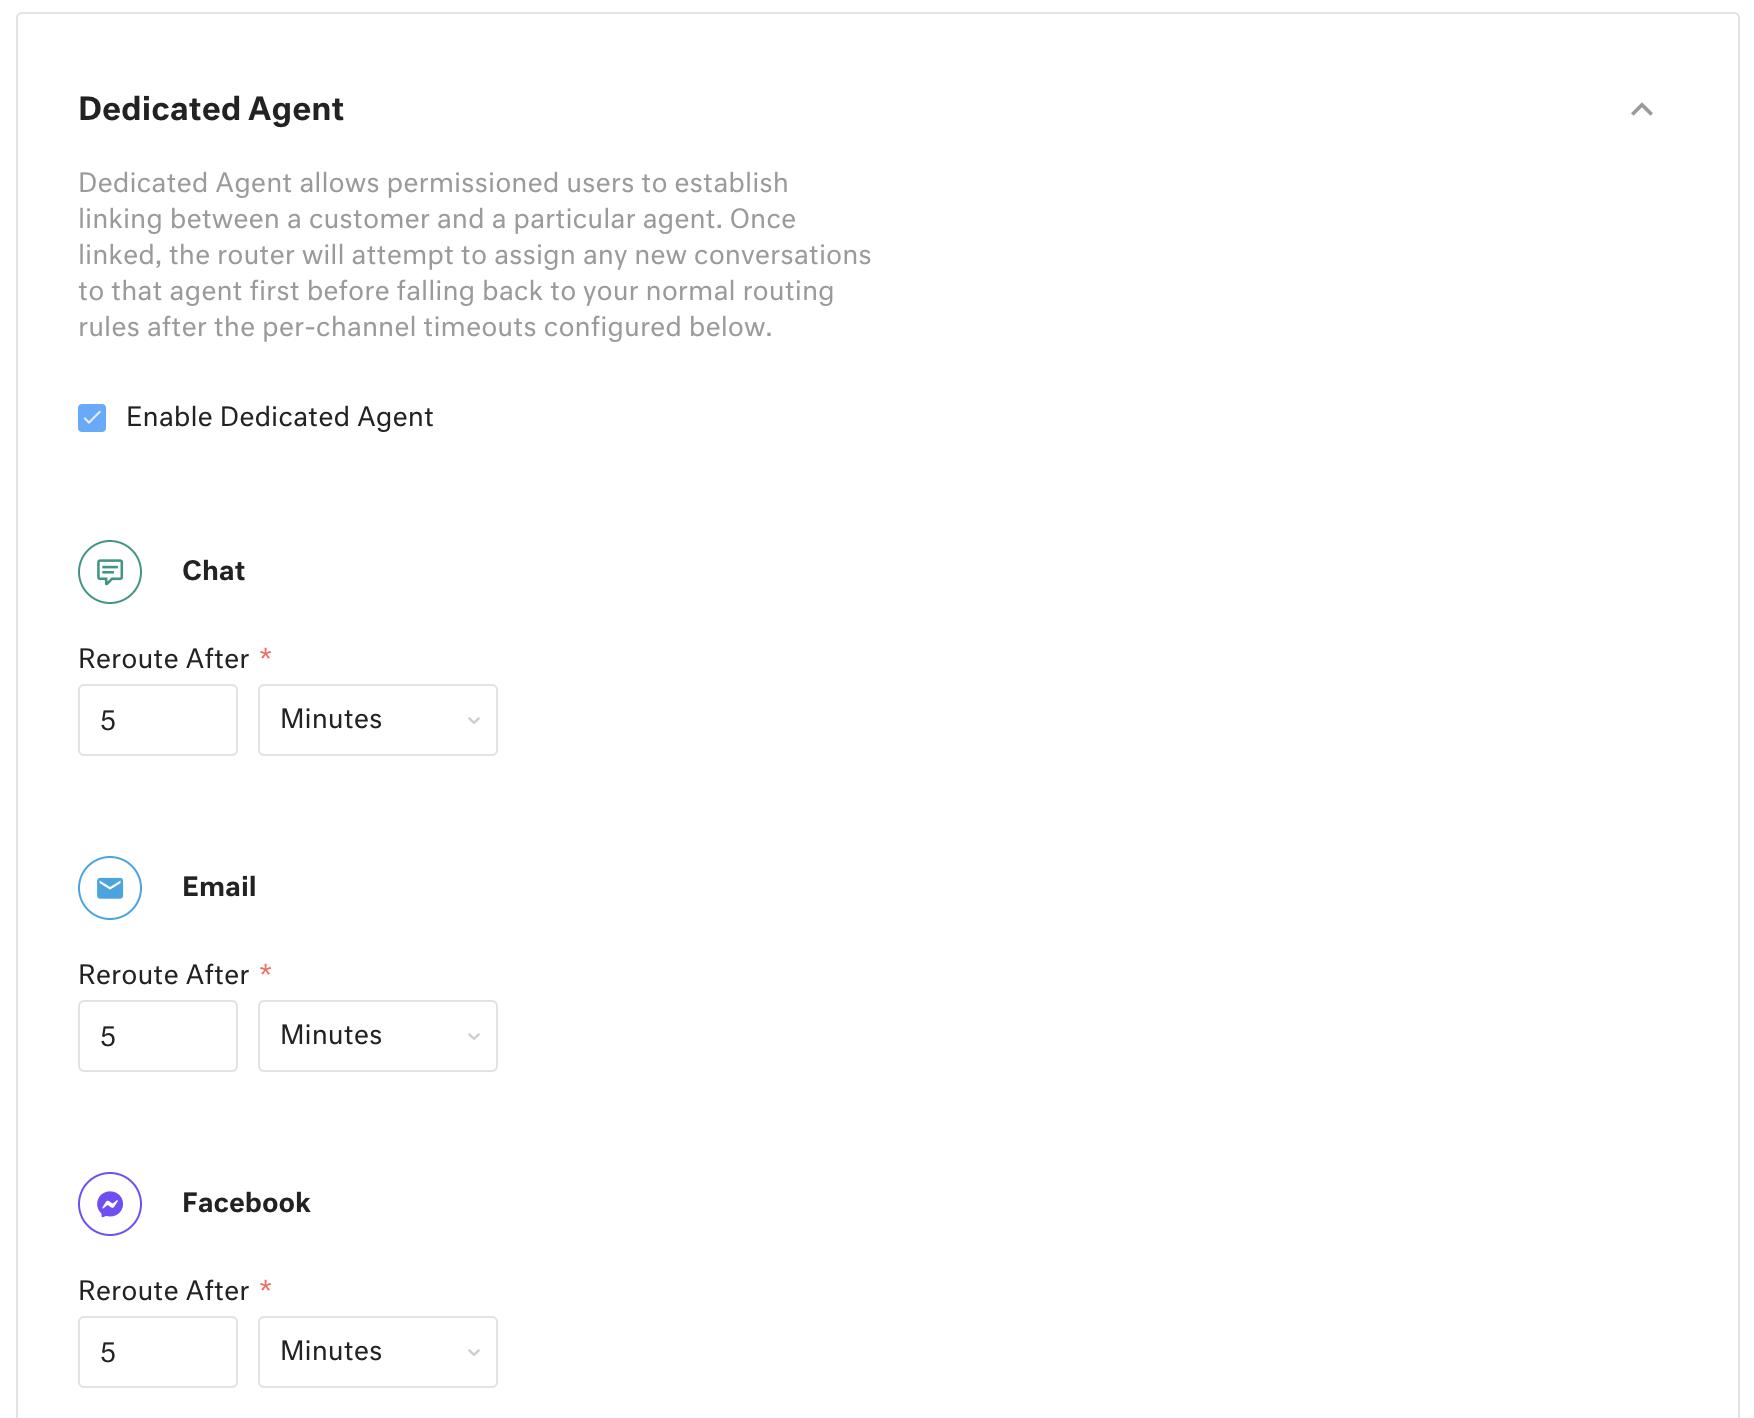 Dedicated Agent